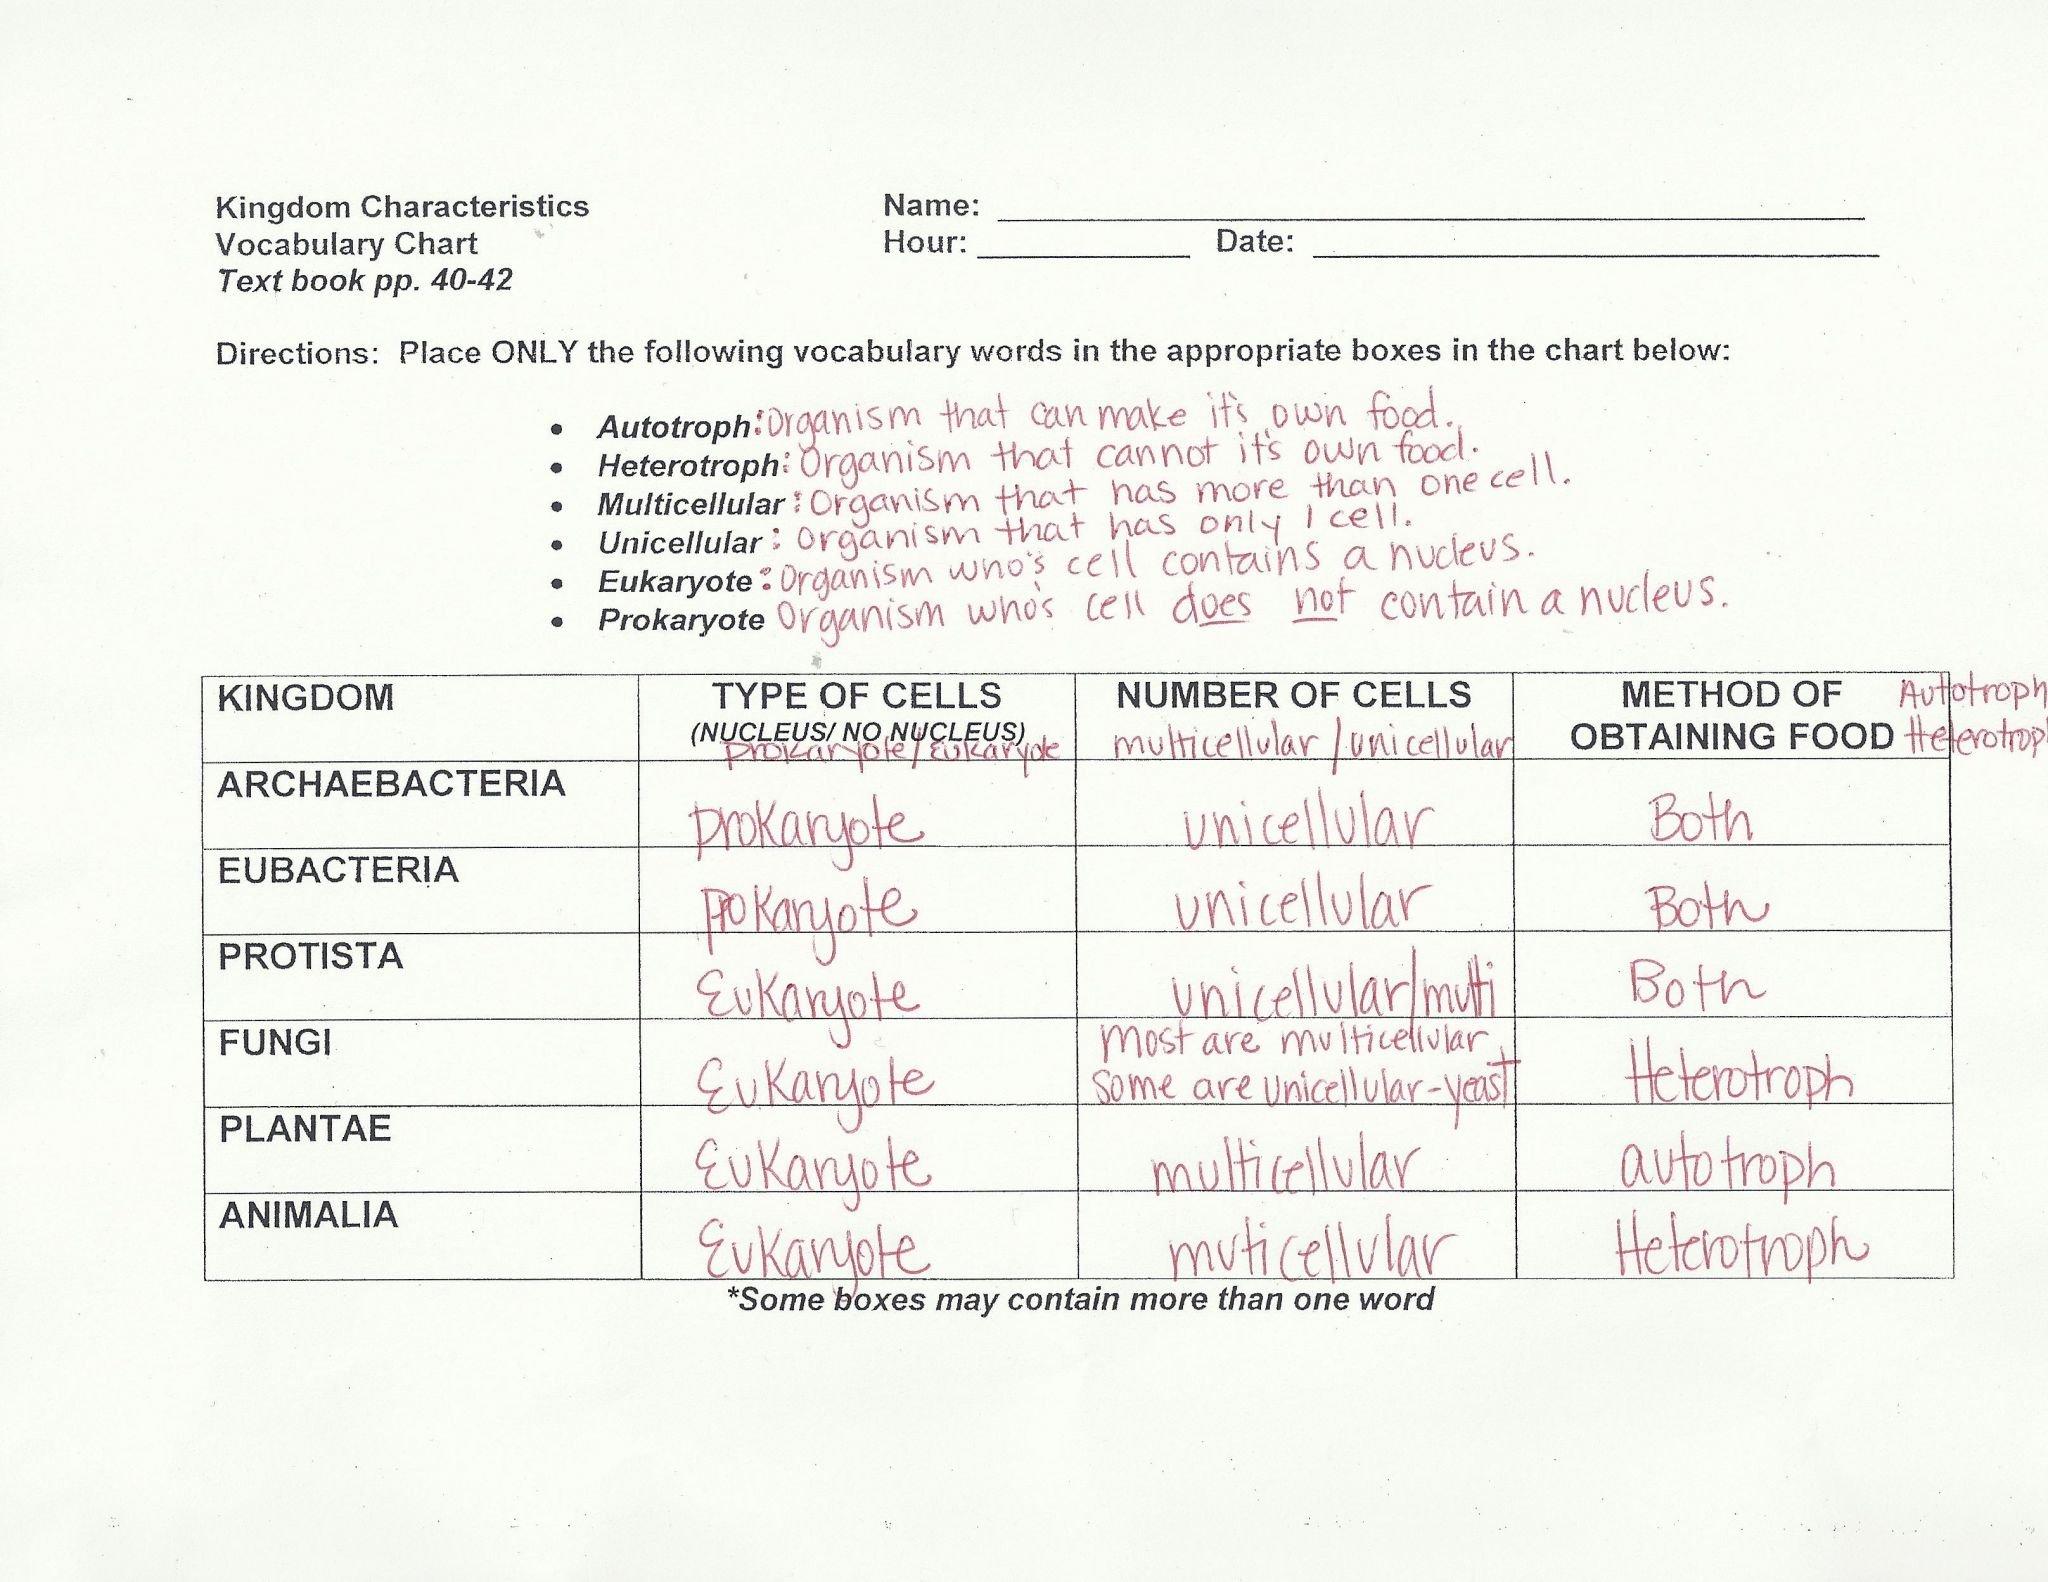 Dna Worksheet Answer Key Mr Hoyle  Briefencounters Inside Dna Worksheet Answer Key Mr Hoyle